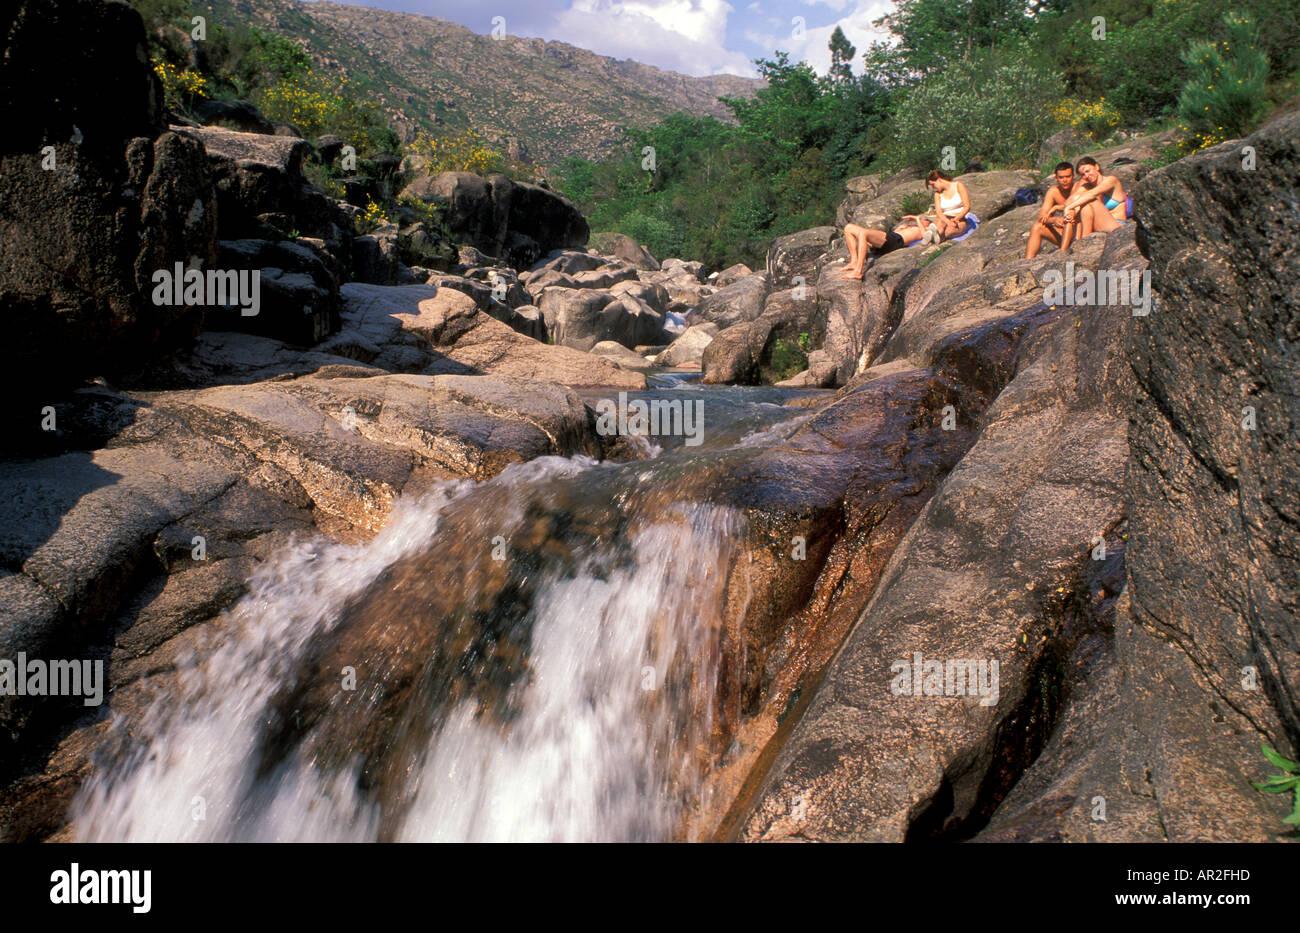 Menschen am Wasserfall, Nationalpark Peneda-Geres, Soajo ...